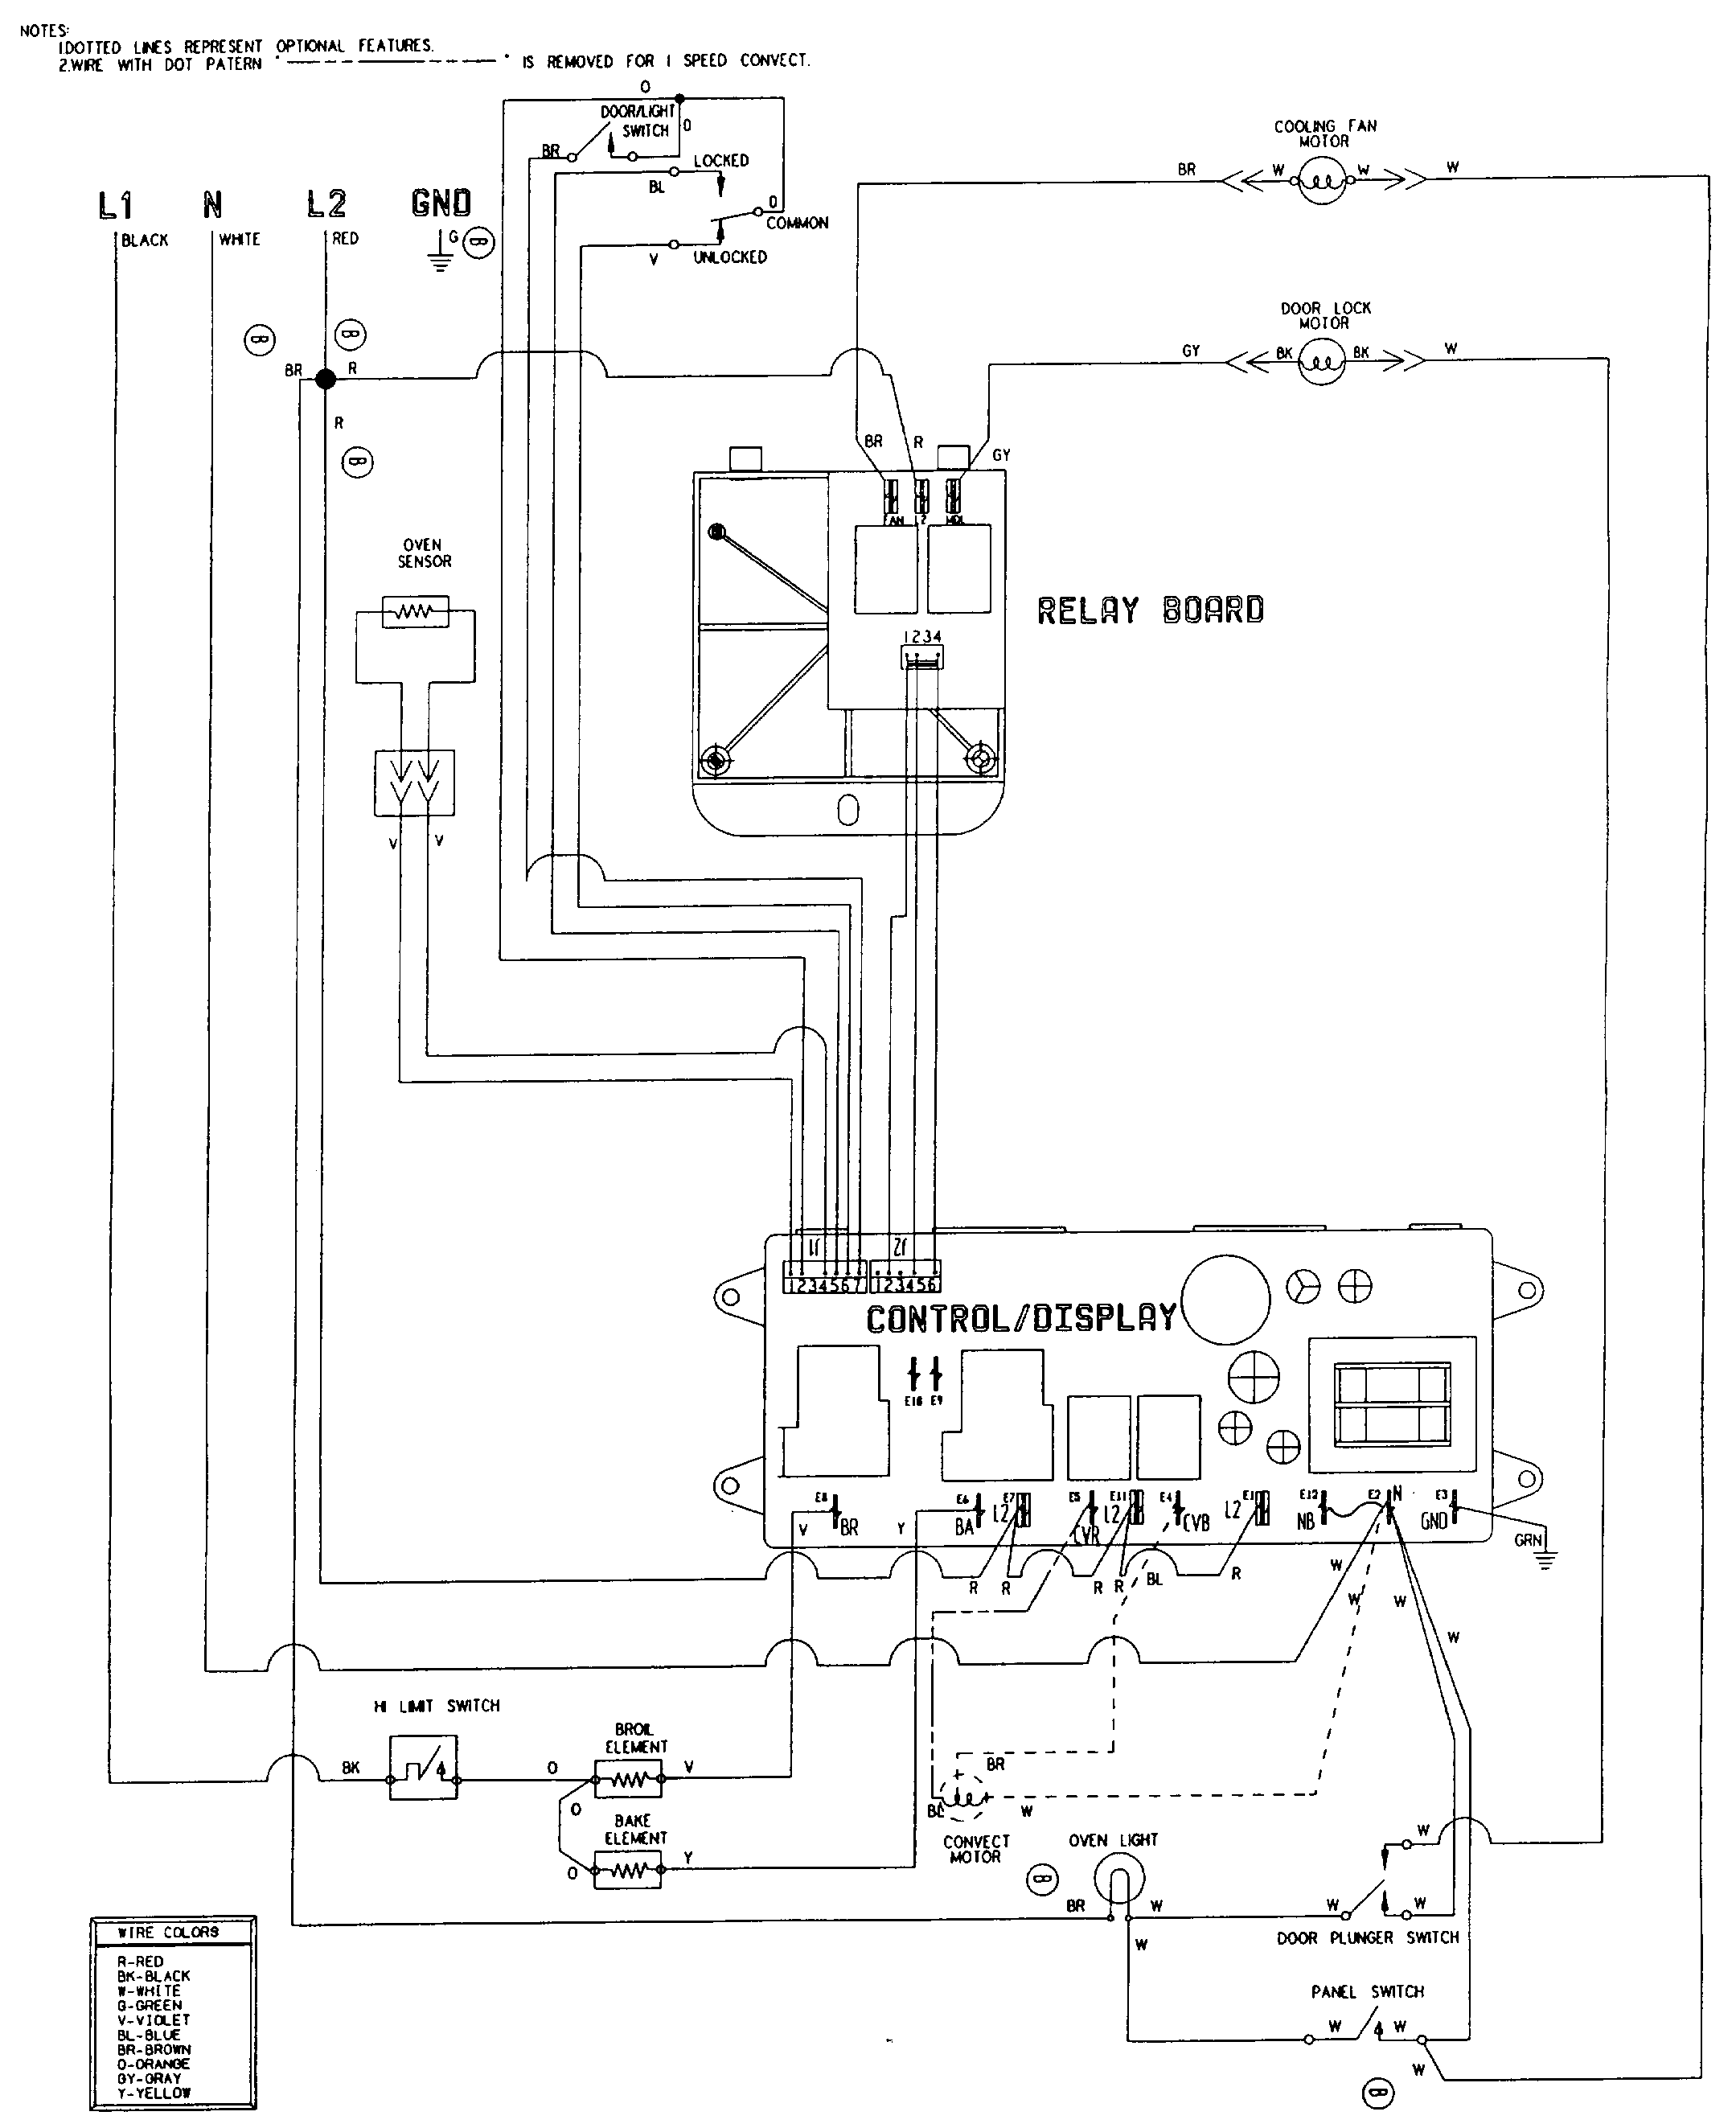 Peachy Wall Clock Wiring Diagram Wiring Diagram Wiring Cloud Rineaidewilluminateatxorg